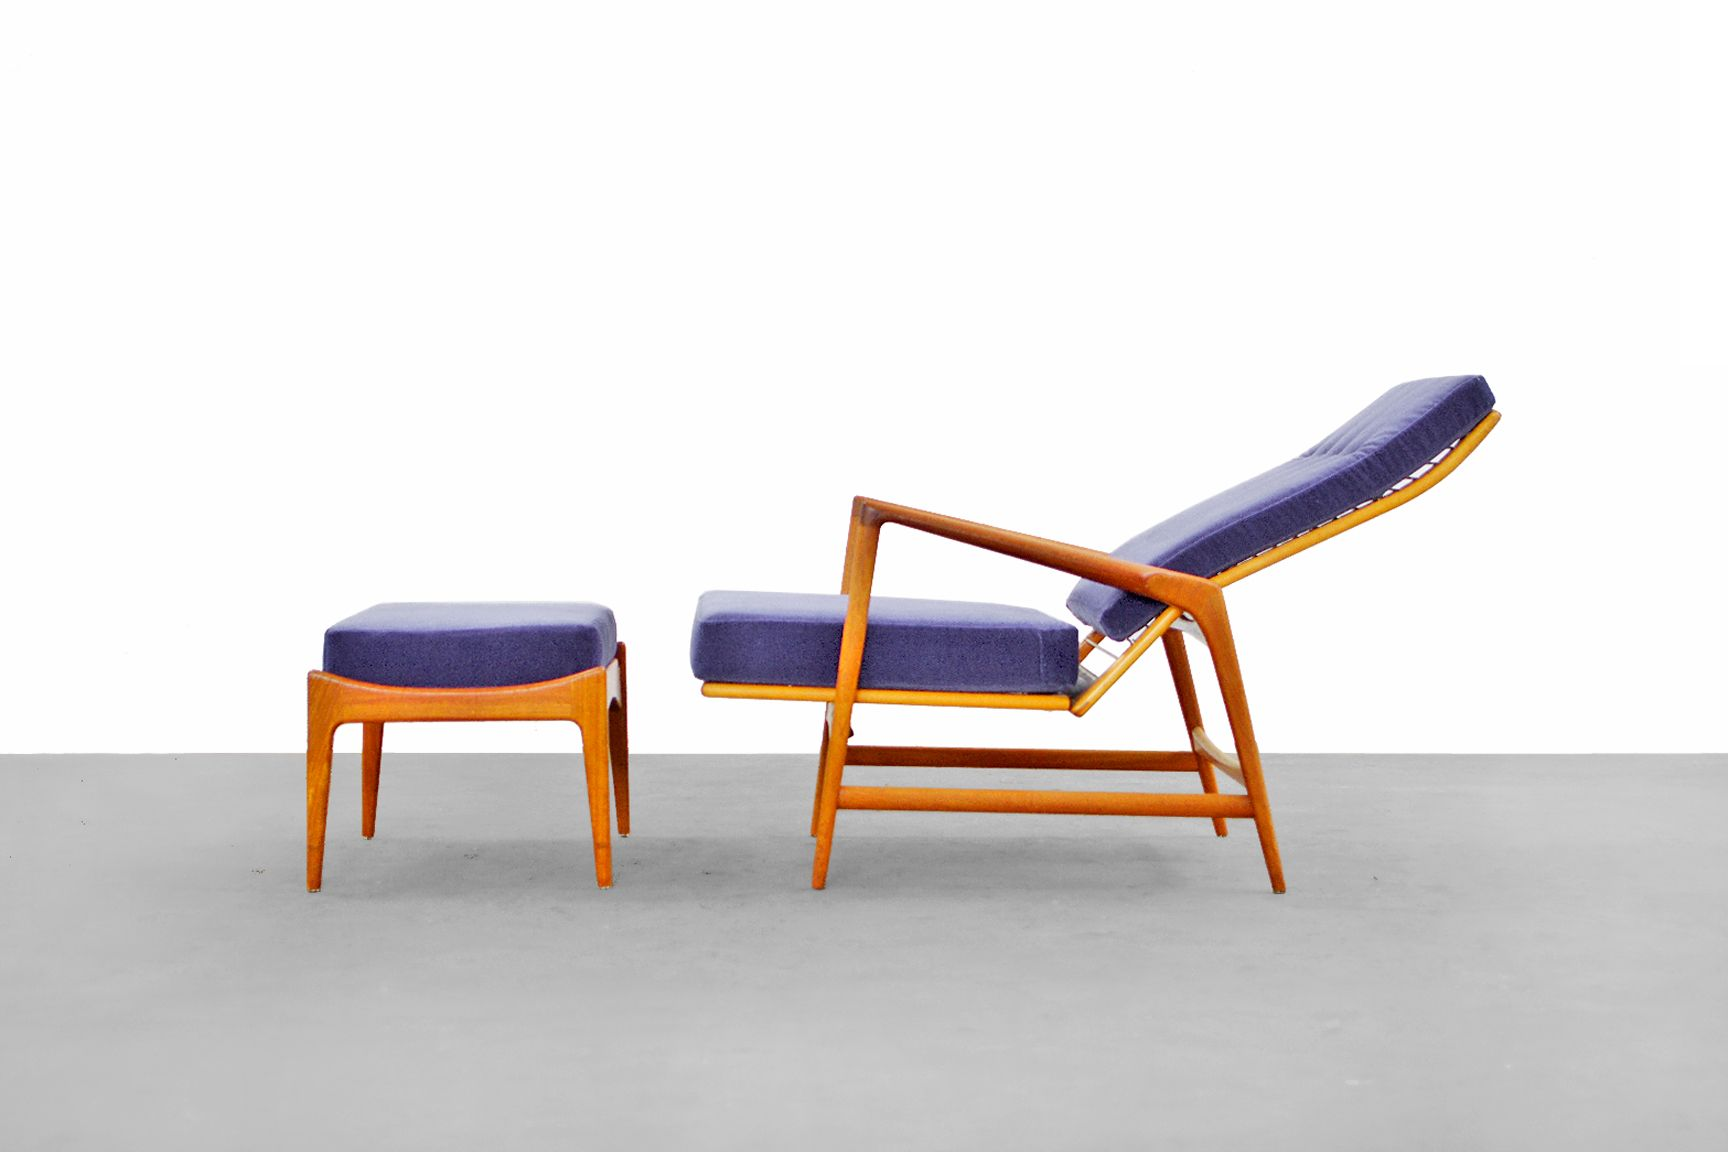 Danish Modern Lounge Chair & Ottoman by Ib Kofod Larsen for Selig for sal